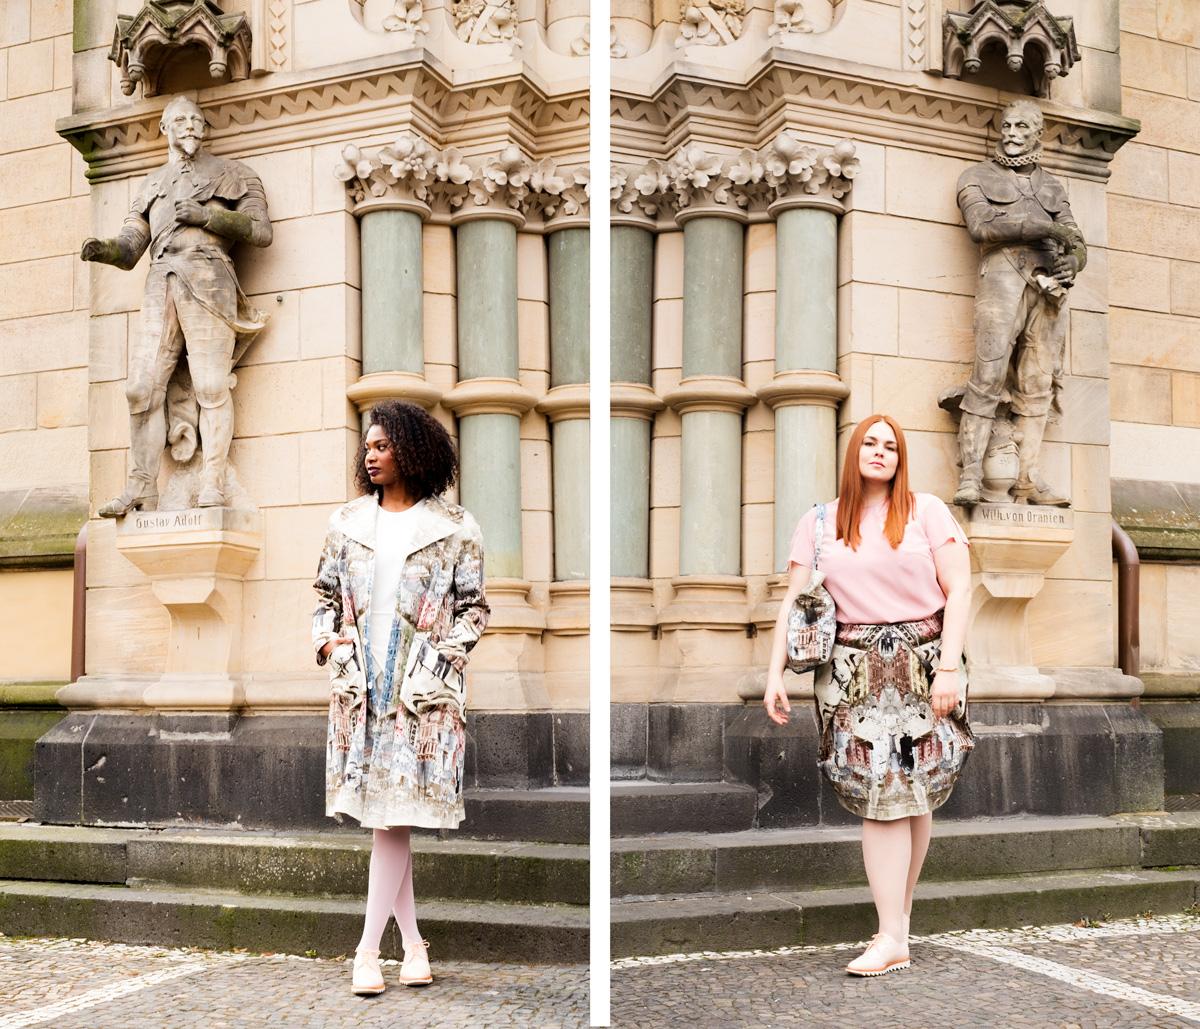 Wiesbaden Möbelhaus galatea ziss atelier f 252 r bekleidung mode handgefertigt nach ma 223 in wiesbaden